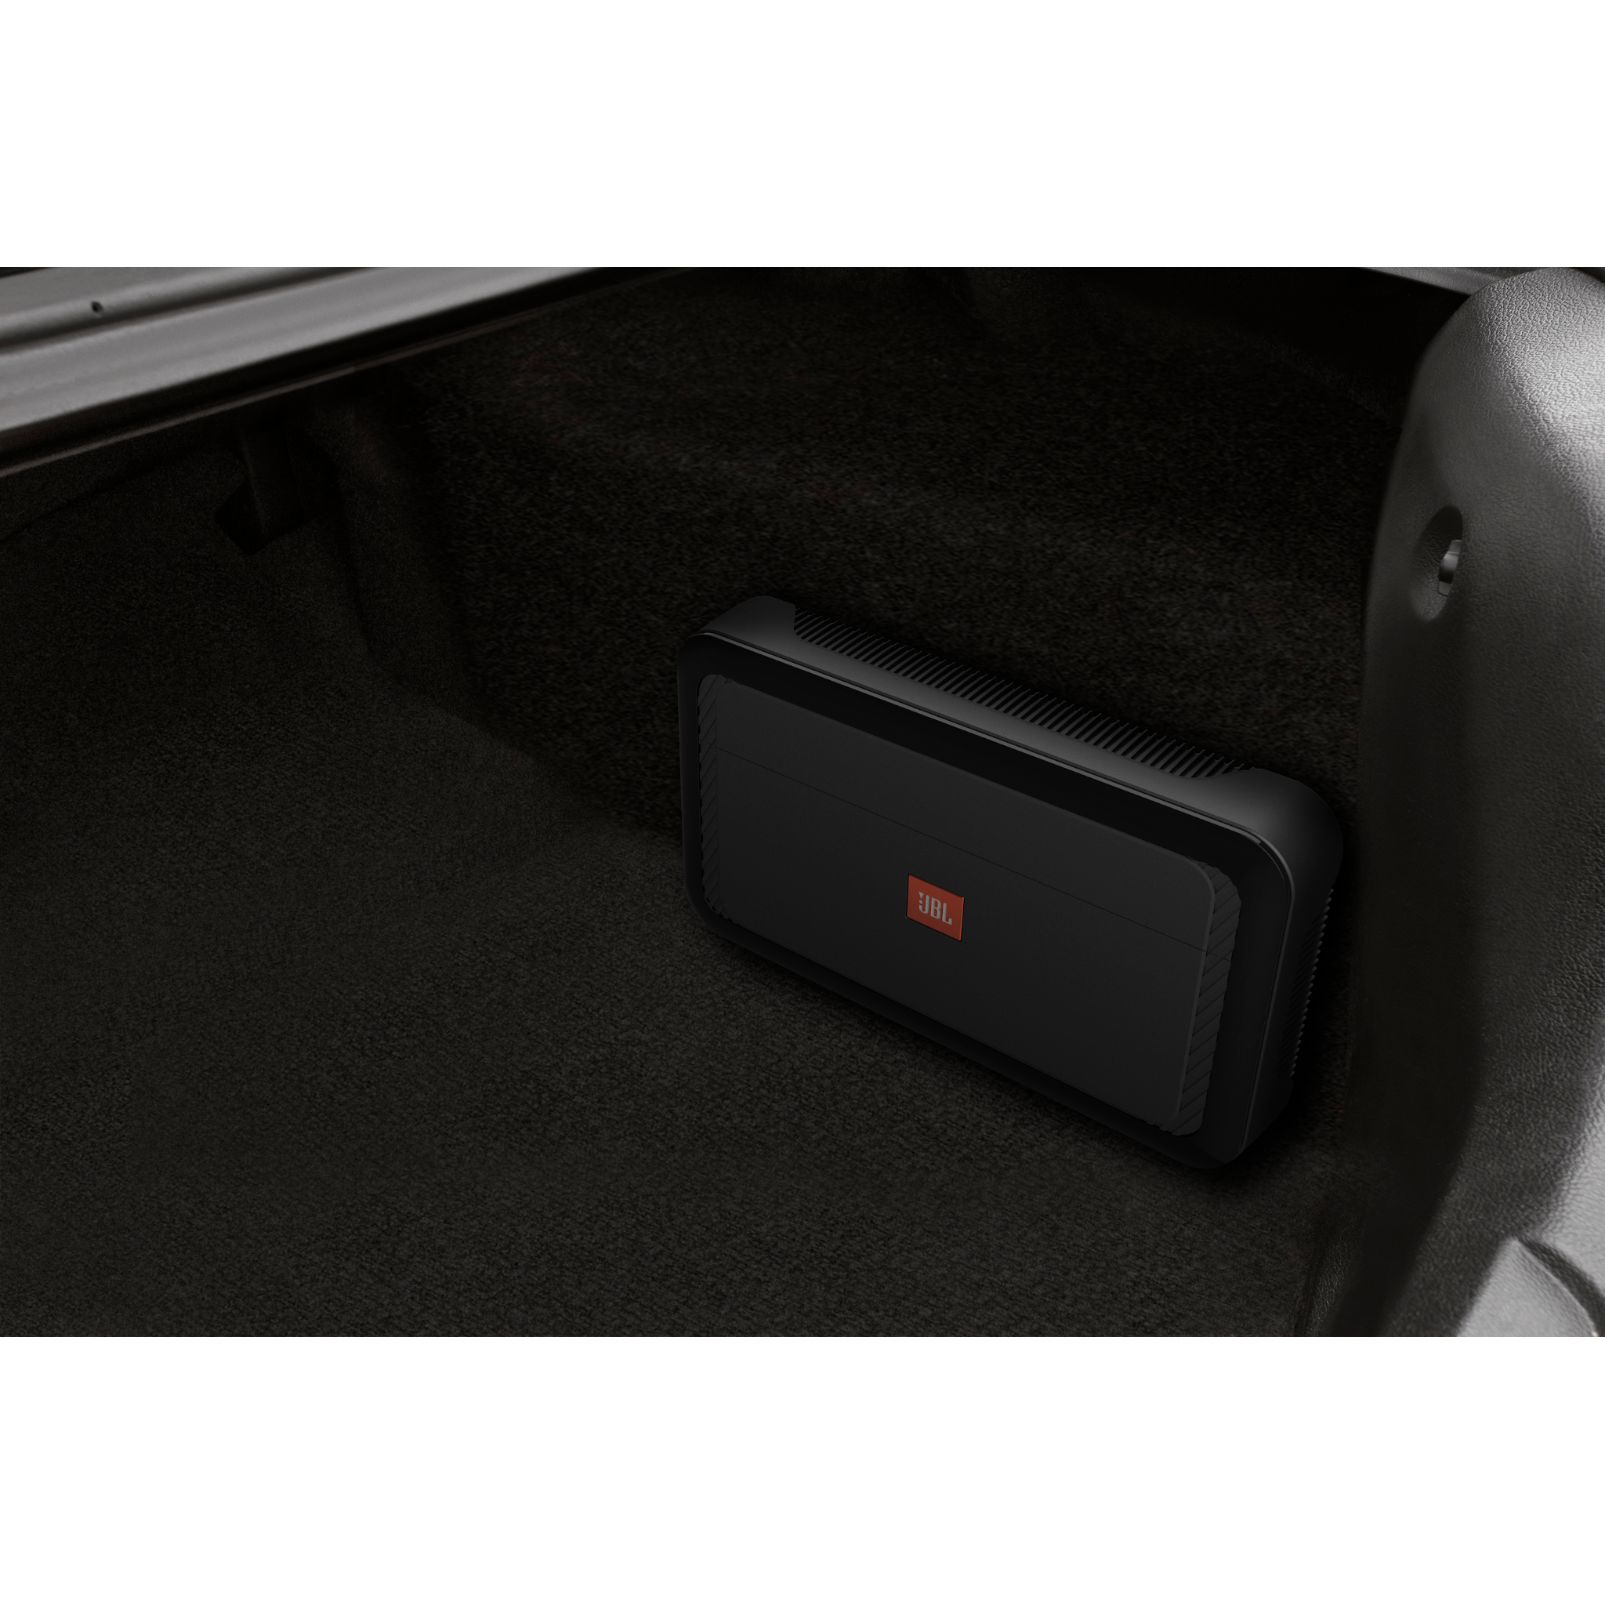 Club A754 - Black - High performance 4 channel car amplifier - Detailshot 3